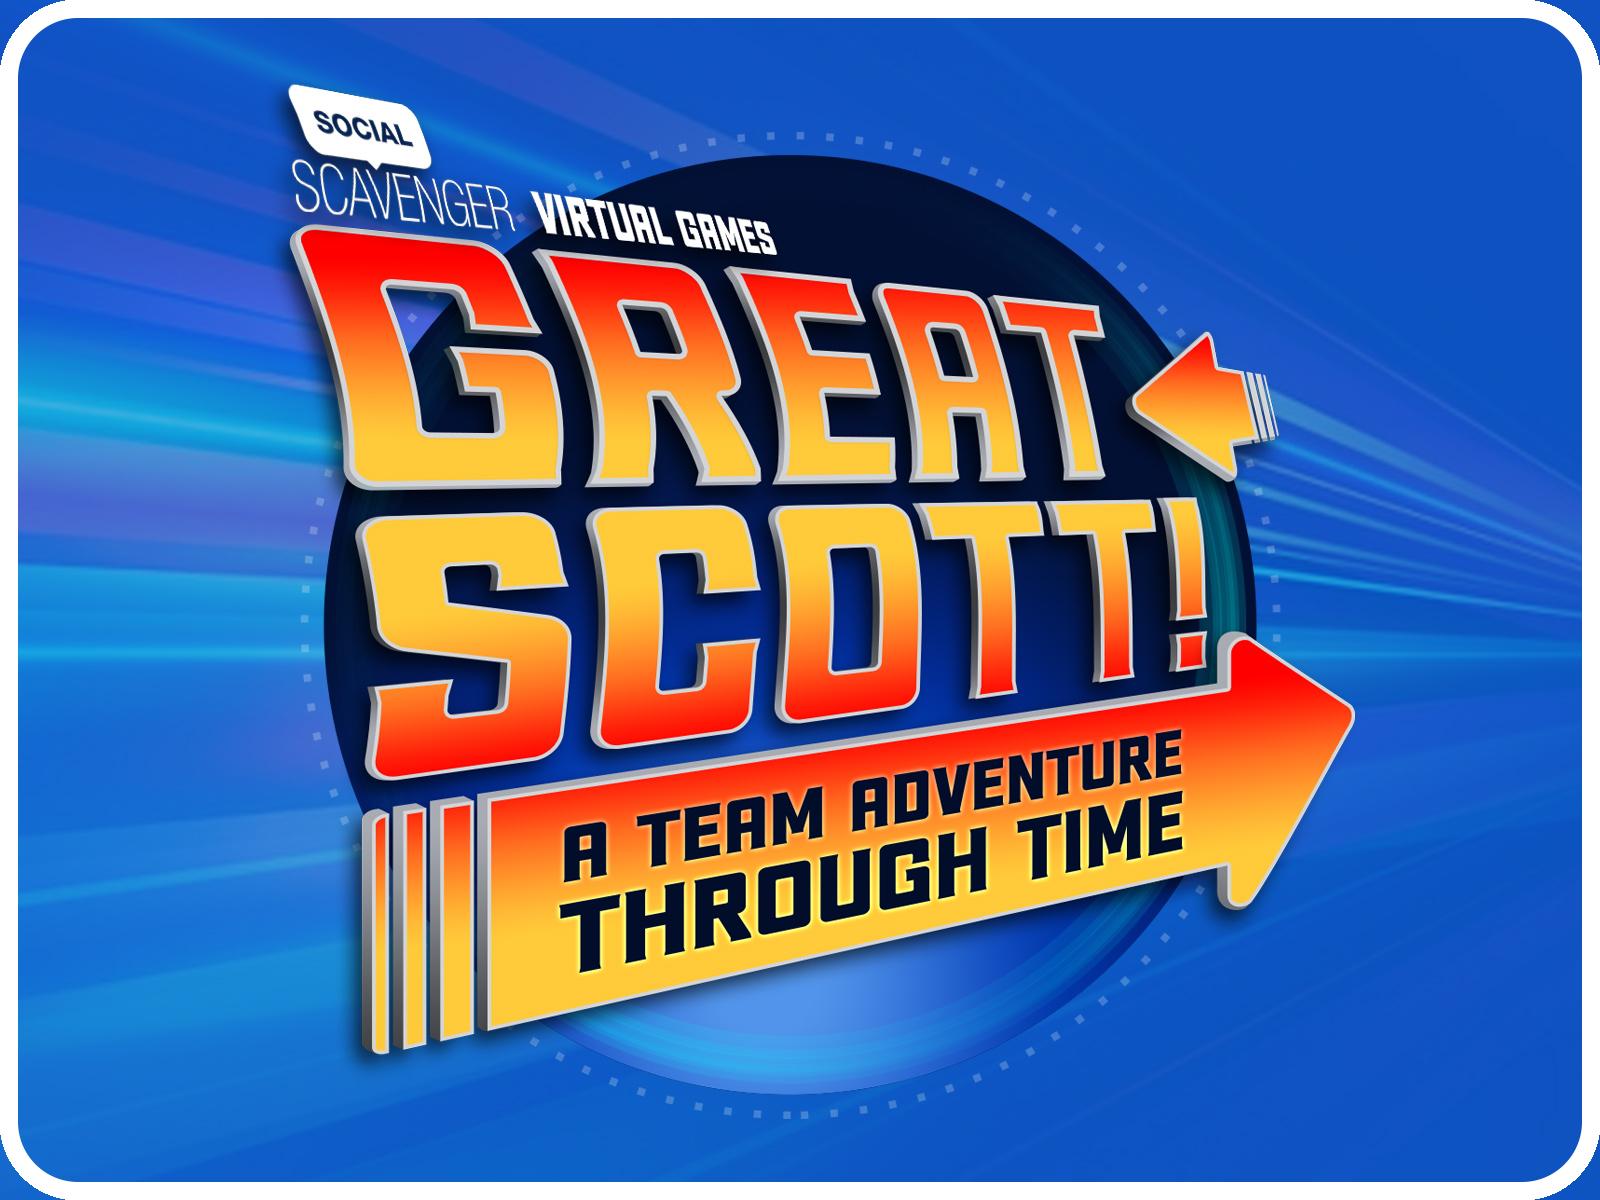 Great Scott! A Team Adventure through Time